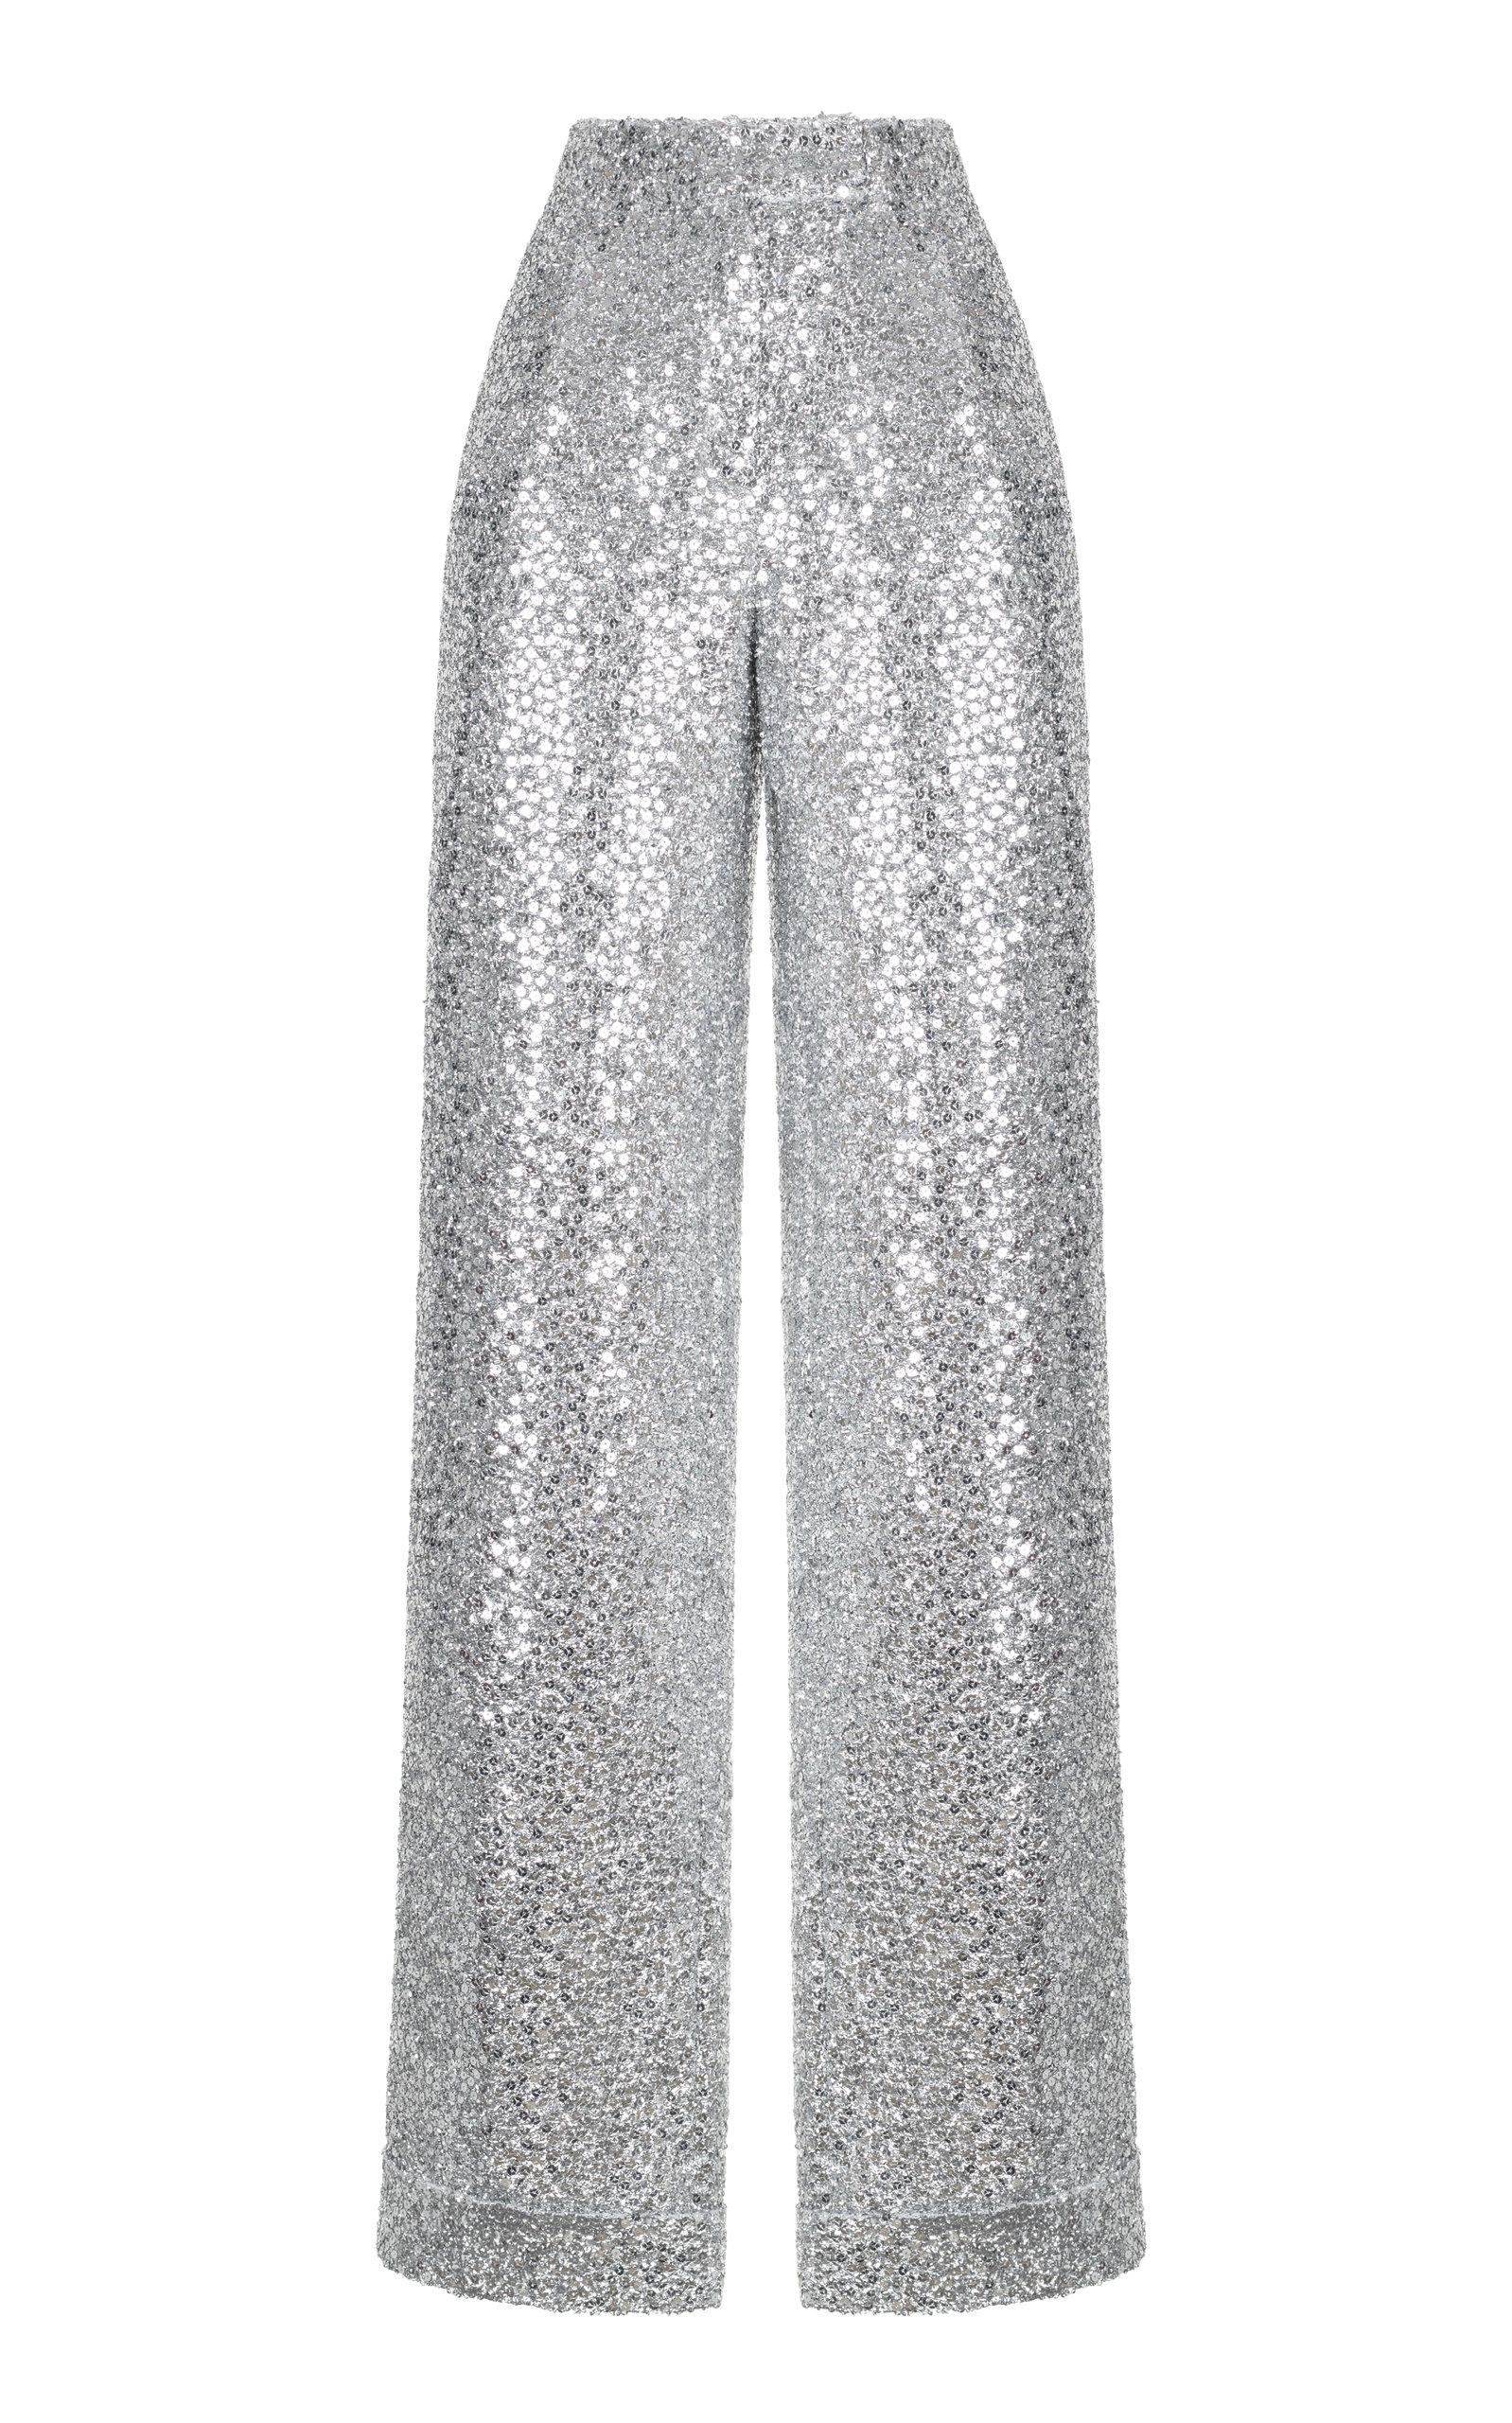 RASARIO Silver Sequin Pants